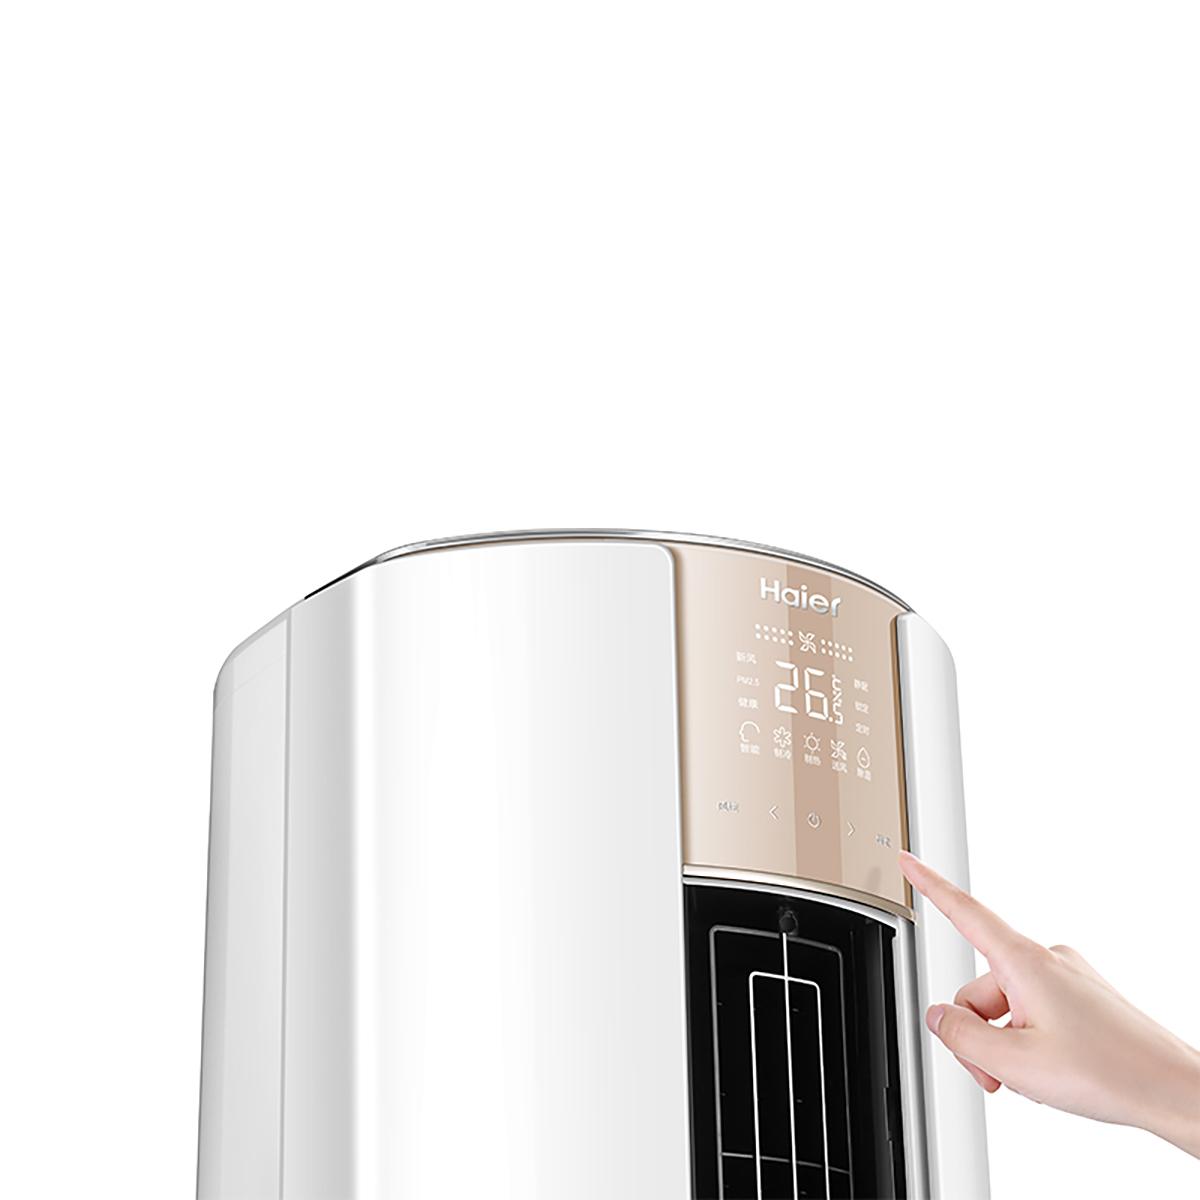 Haier/海尔 无氟变频柜式空调 KFR-72LW/09VTM21AU1套机